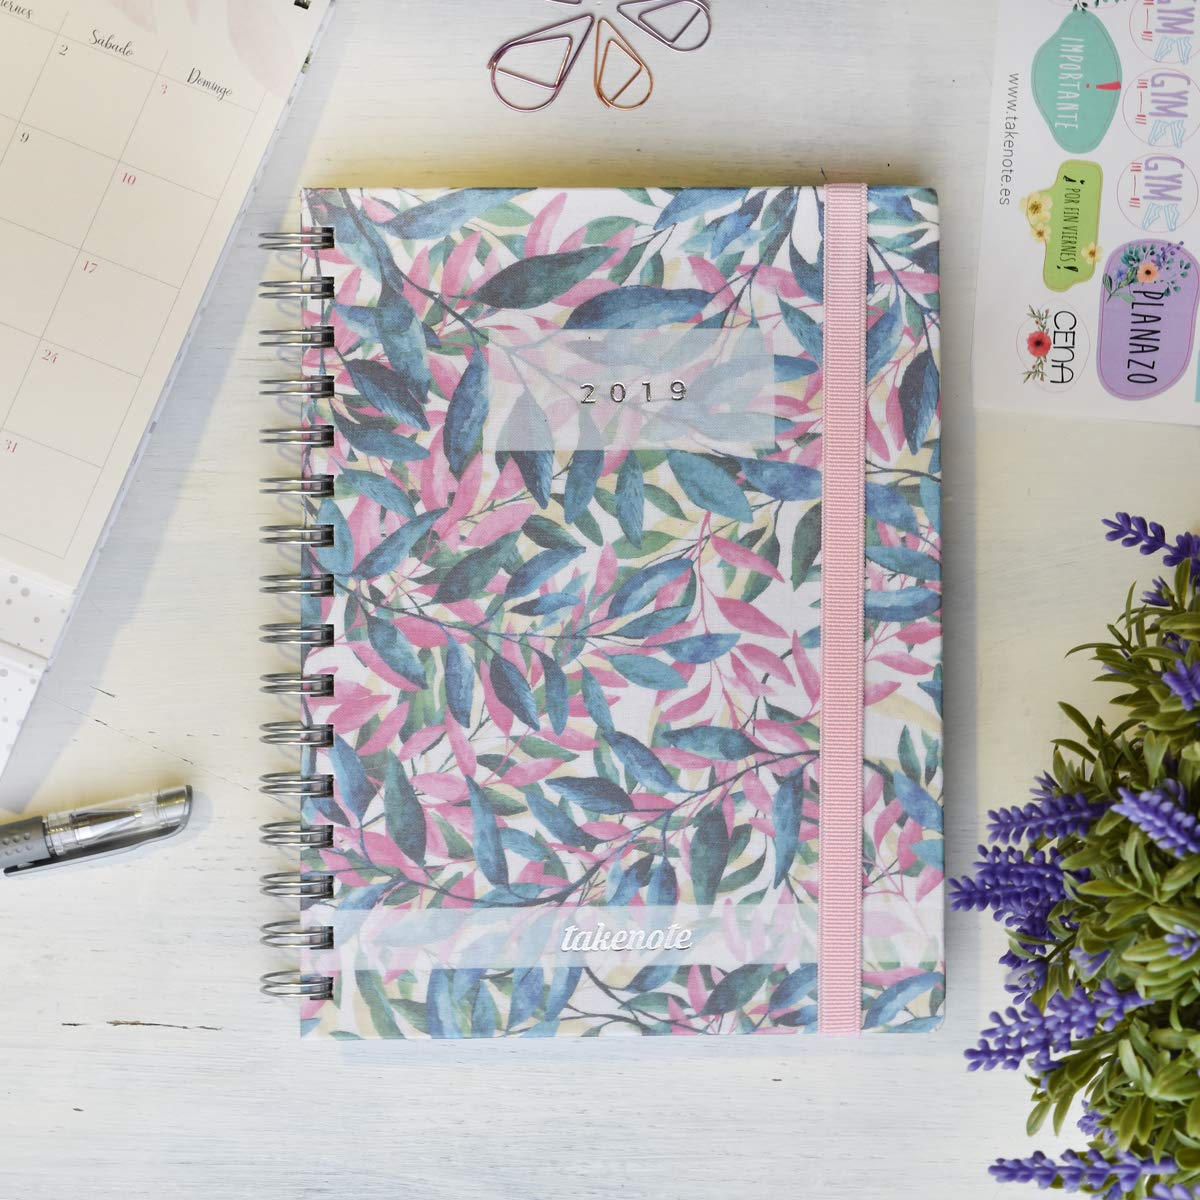 Agenda De Tela 2019 - Takenote Floral- Encuadernación Wire-o - Semana Vista - Tamaño 16,5x21,5